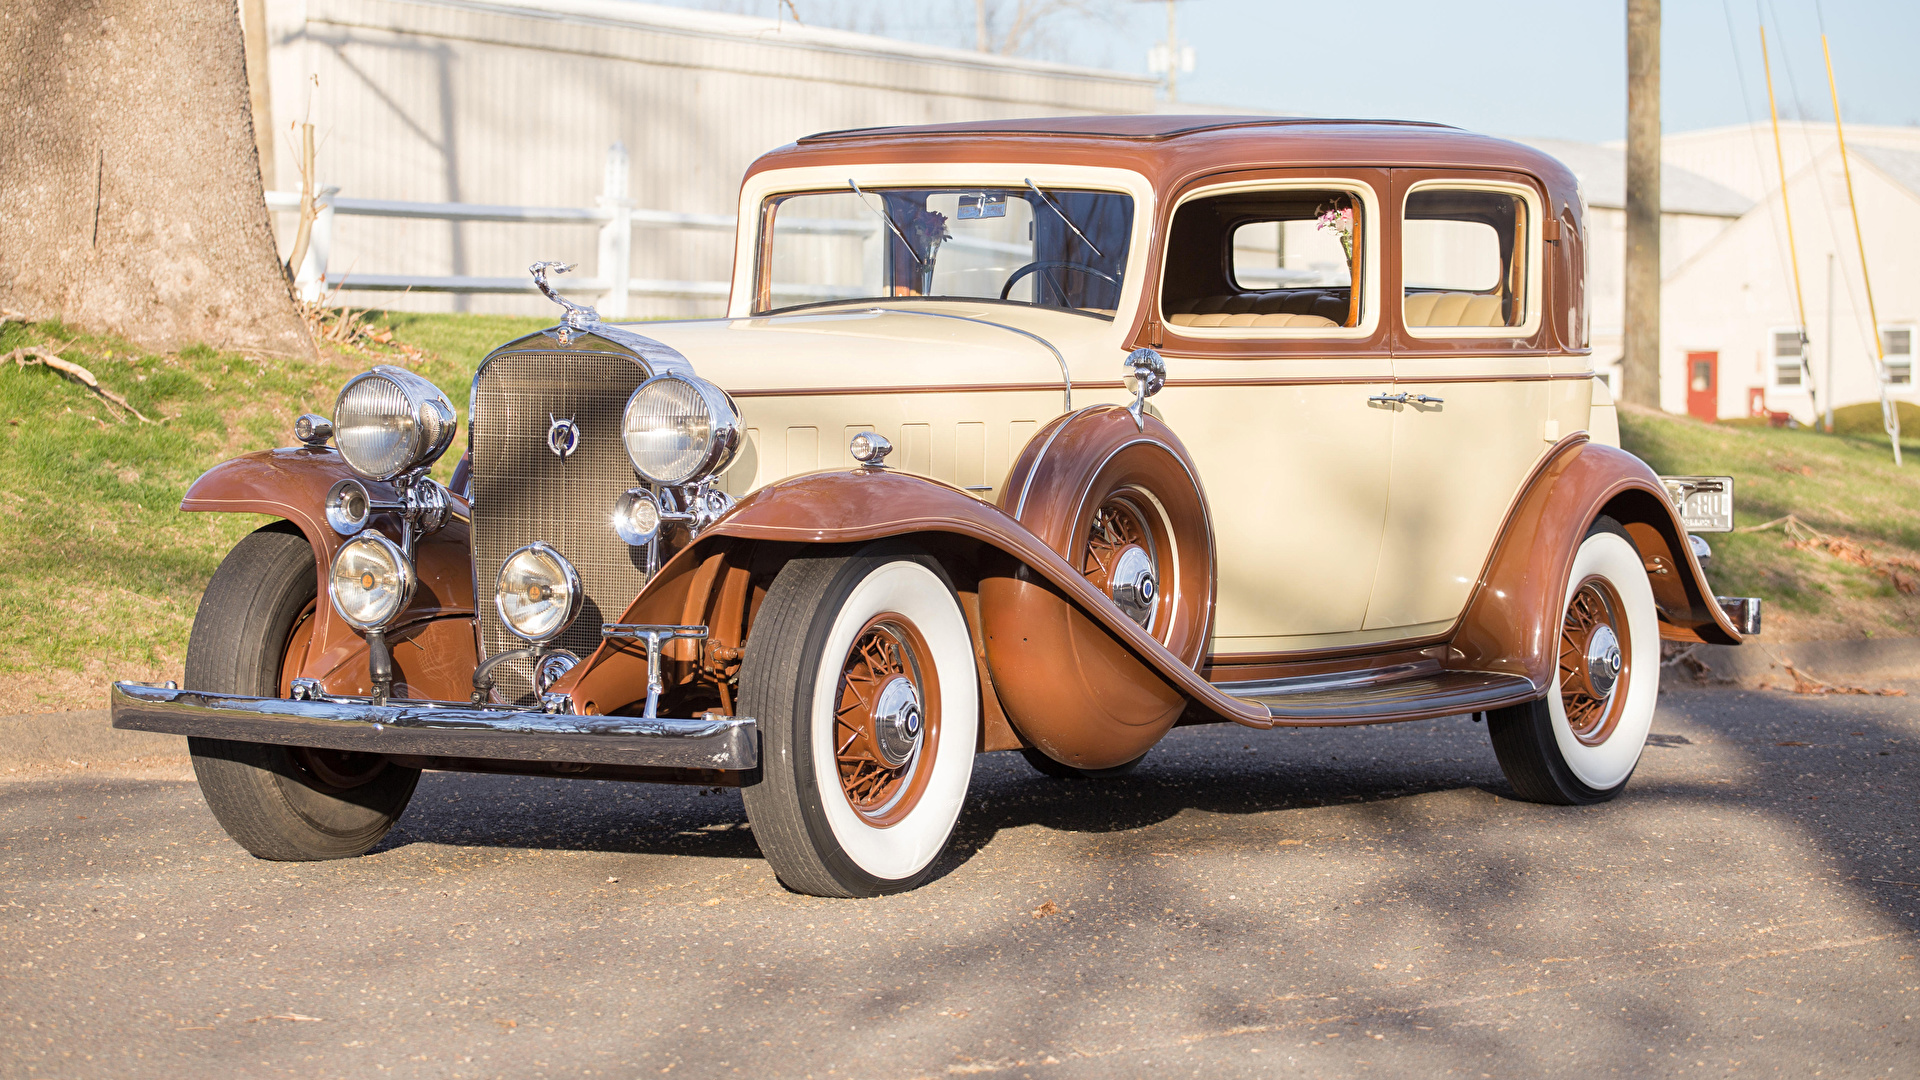 Фото Кадиллак 1932 V12 370-B Town Sedan by Fisher авто 1920x1080 Cadillac машина машины Автомобили автомобиль